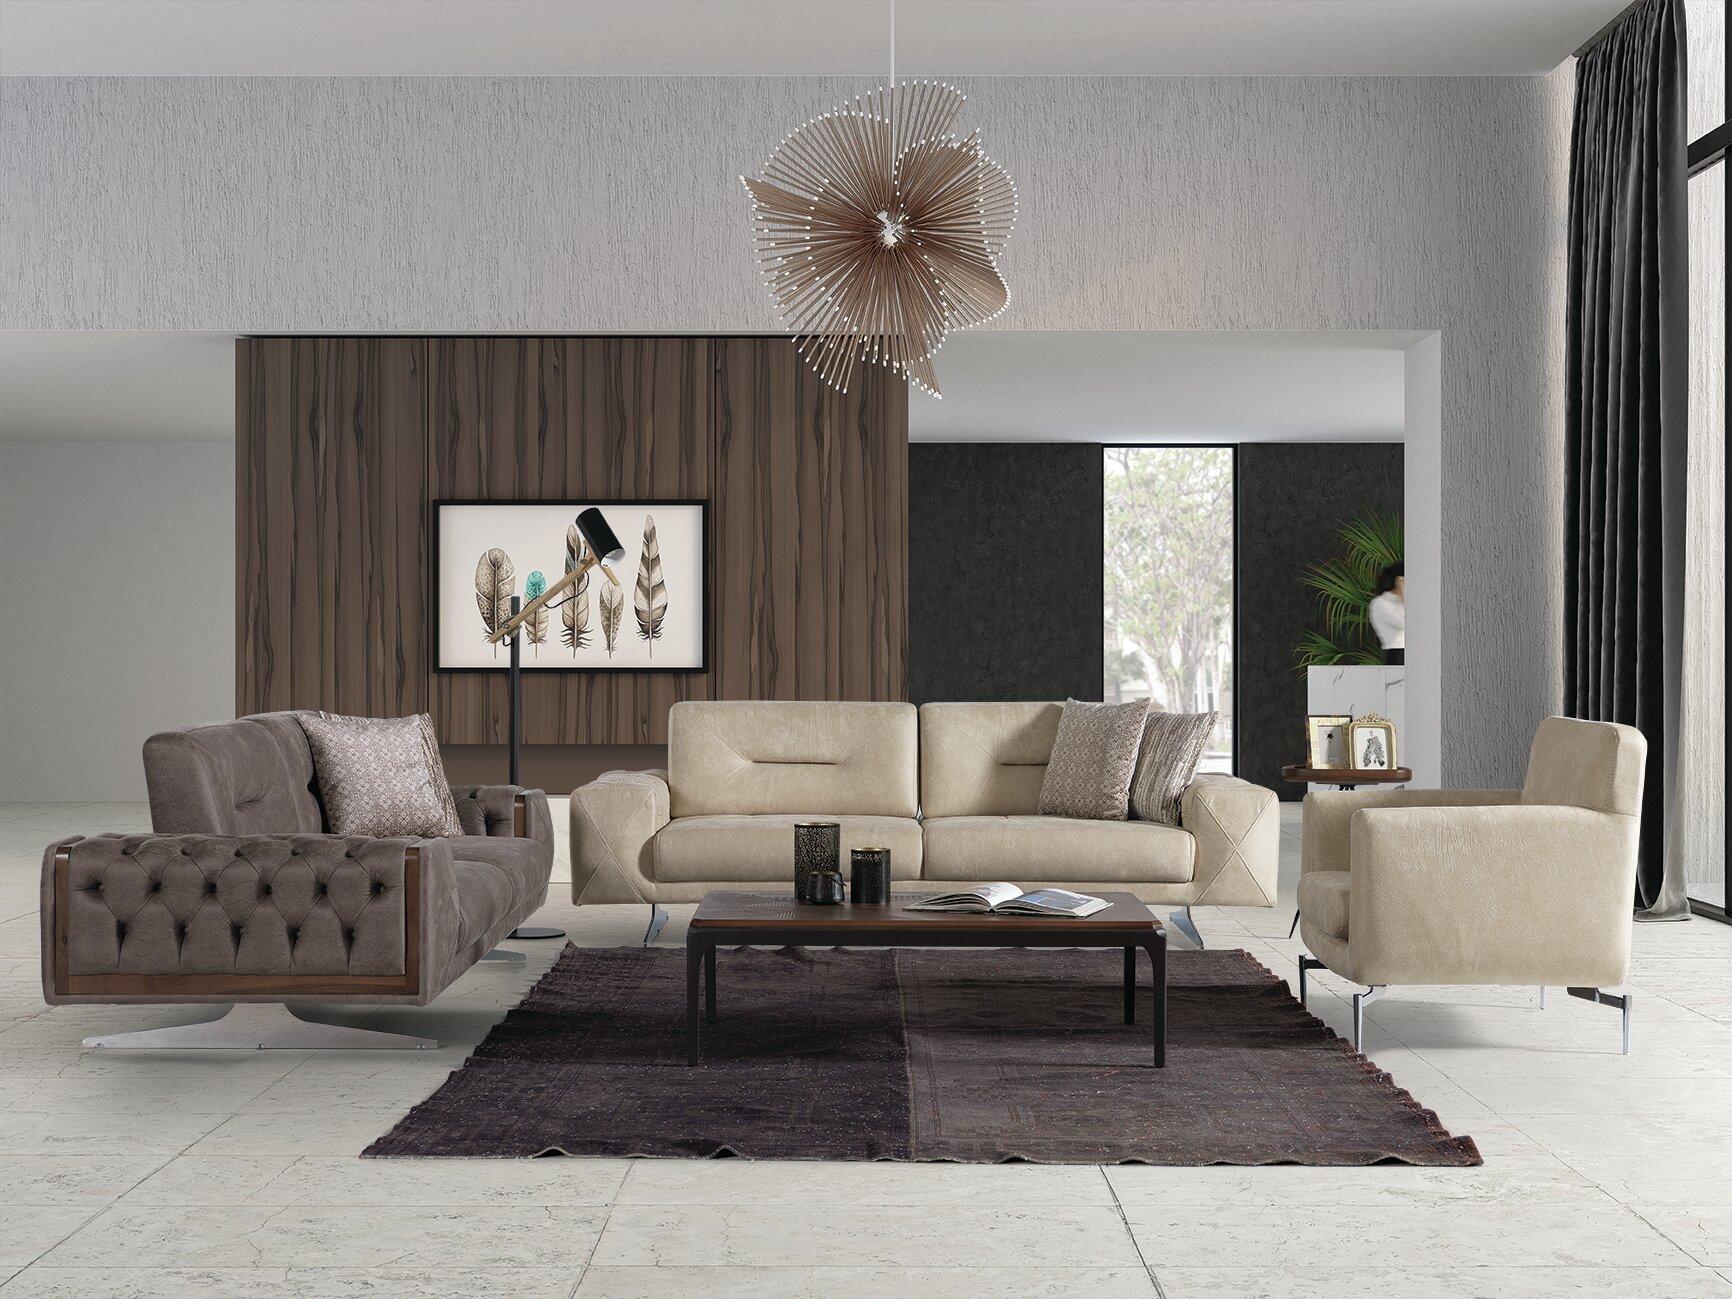 Reclining Sofa Orren Ellis Living Room Sets You Ll Love In 2021 Wayfair